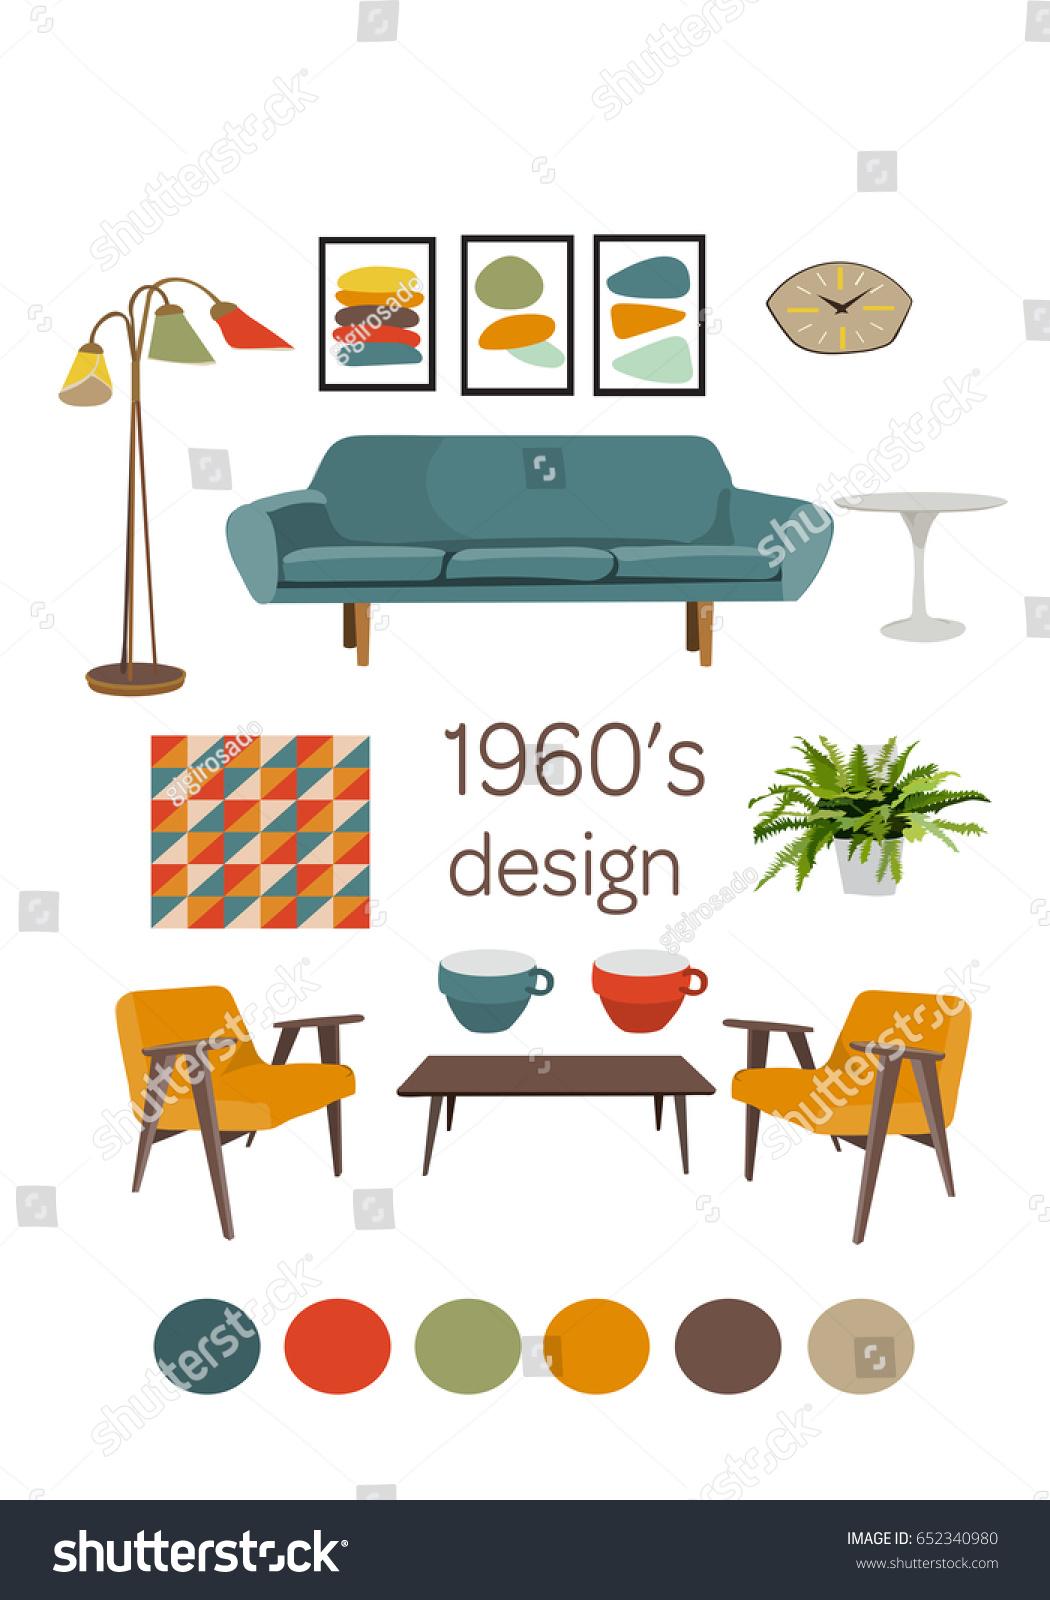 Interior design 1960 mid century modern furniture vector elements set mood board of